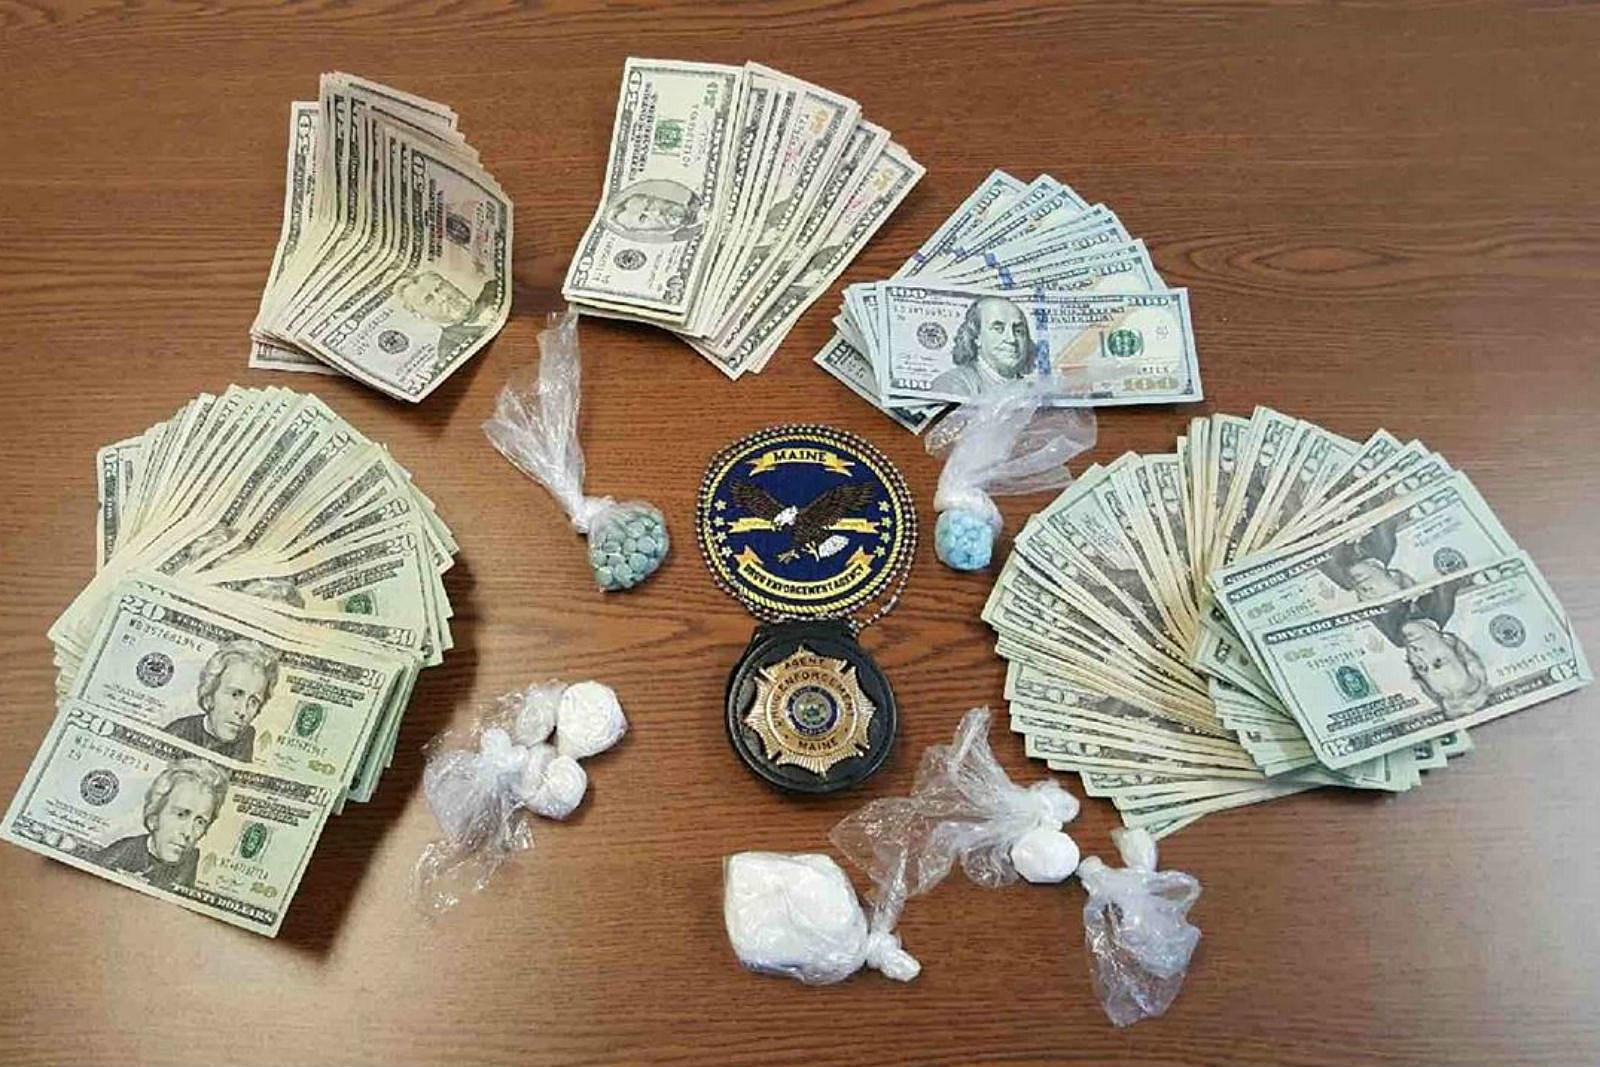 Maine Drug Enforcement Agency